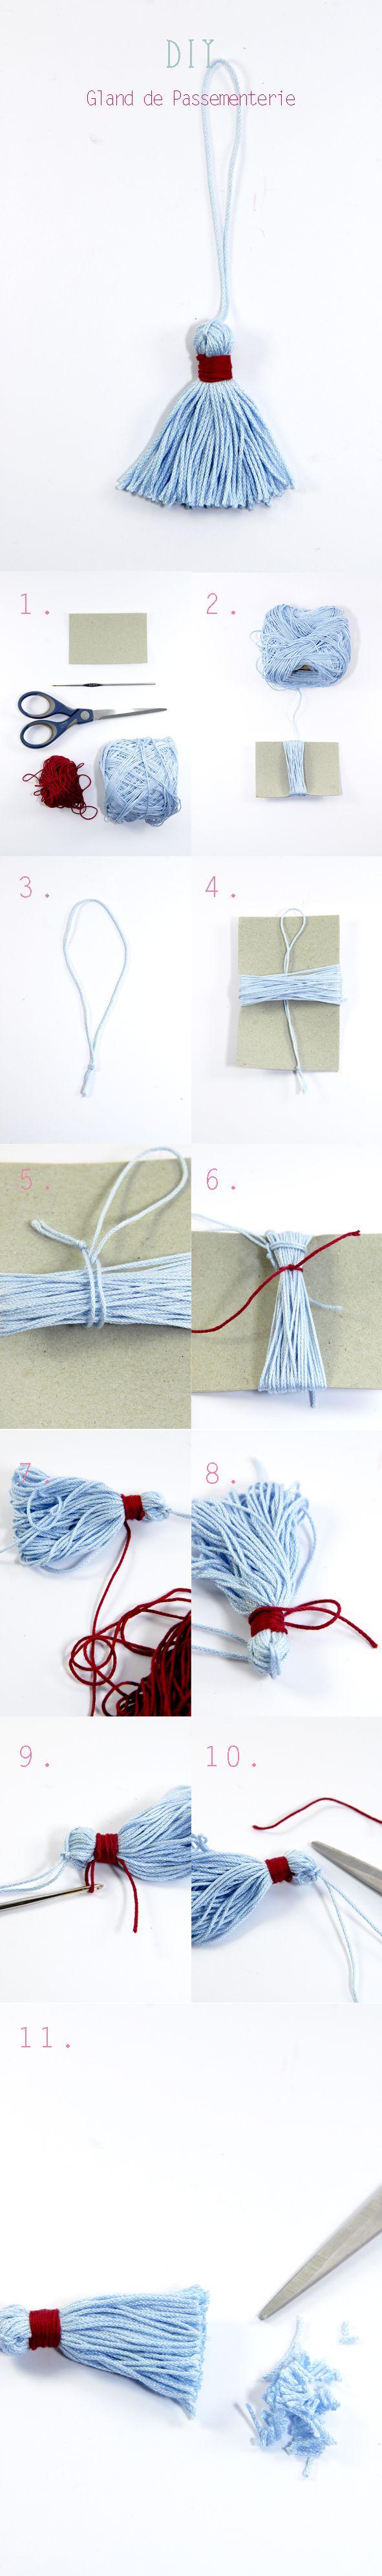 DIY gland de passementerie ou pompon